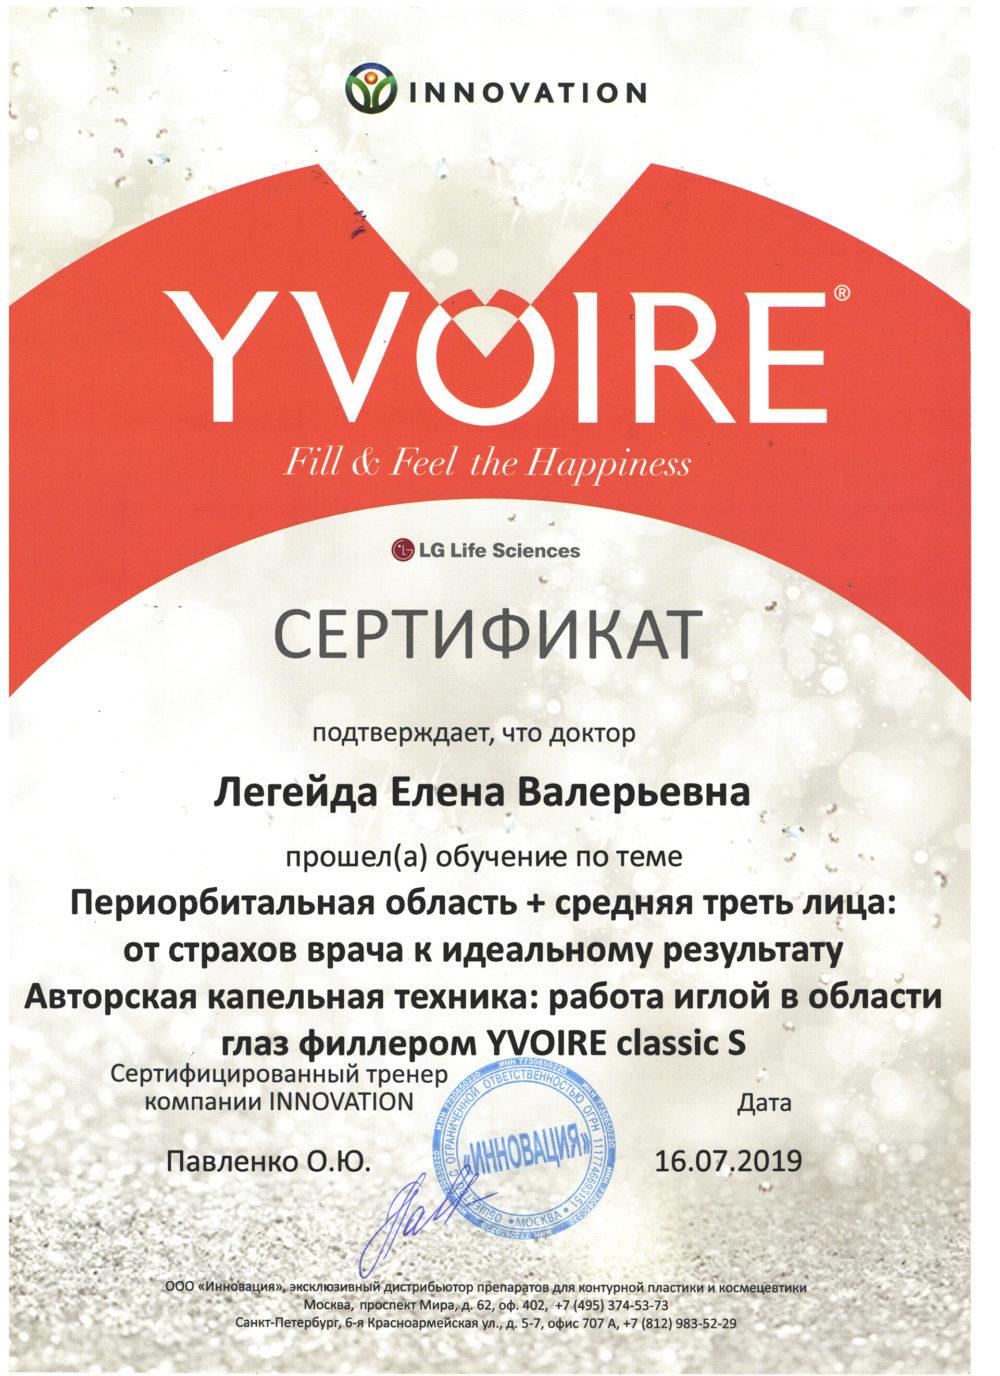 Сертификат - Yvoire. Легейда Елена Валерьевна